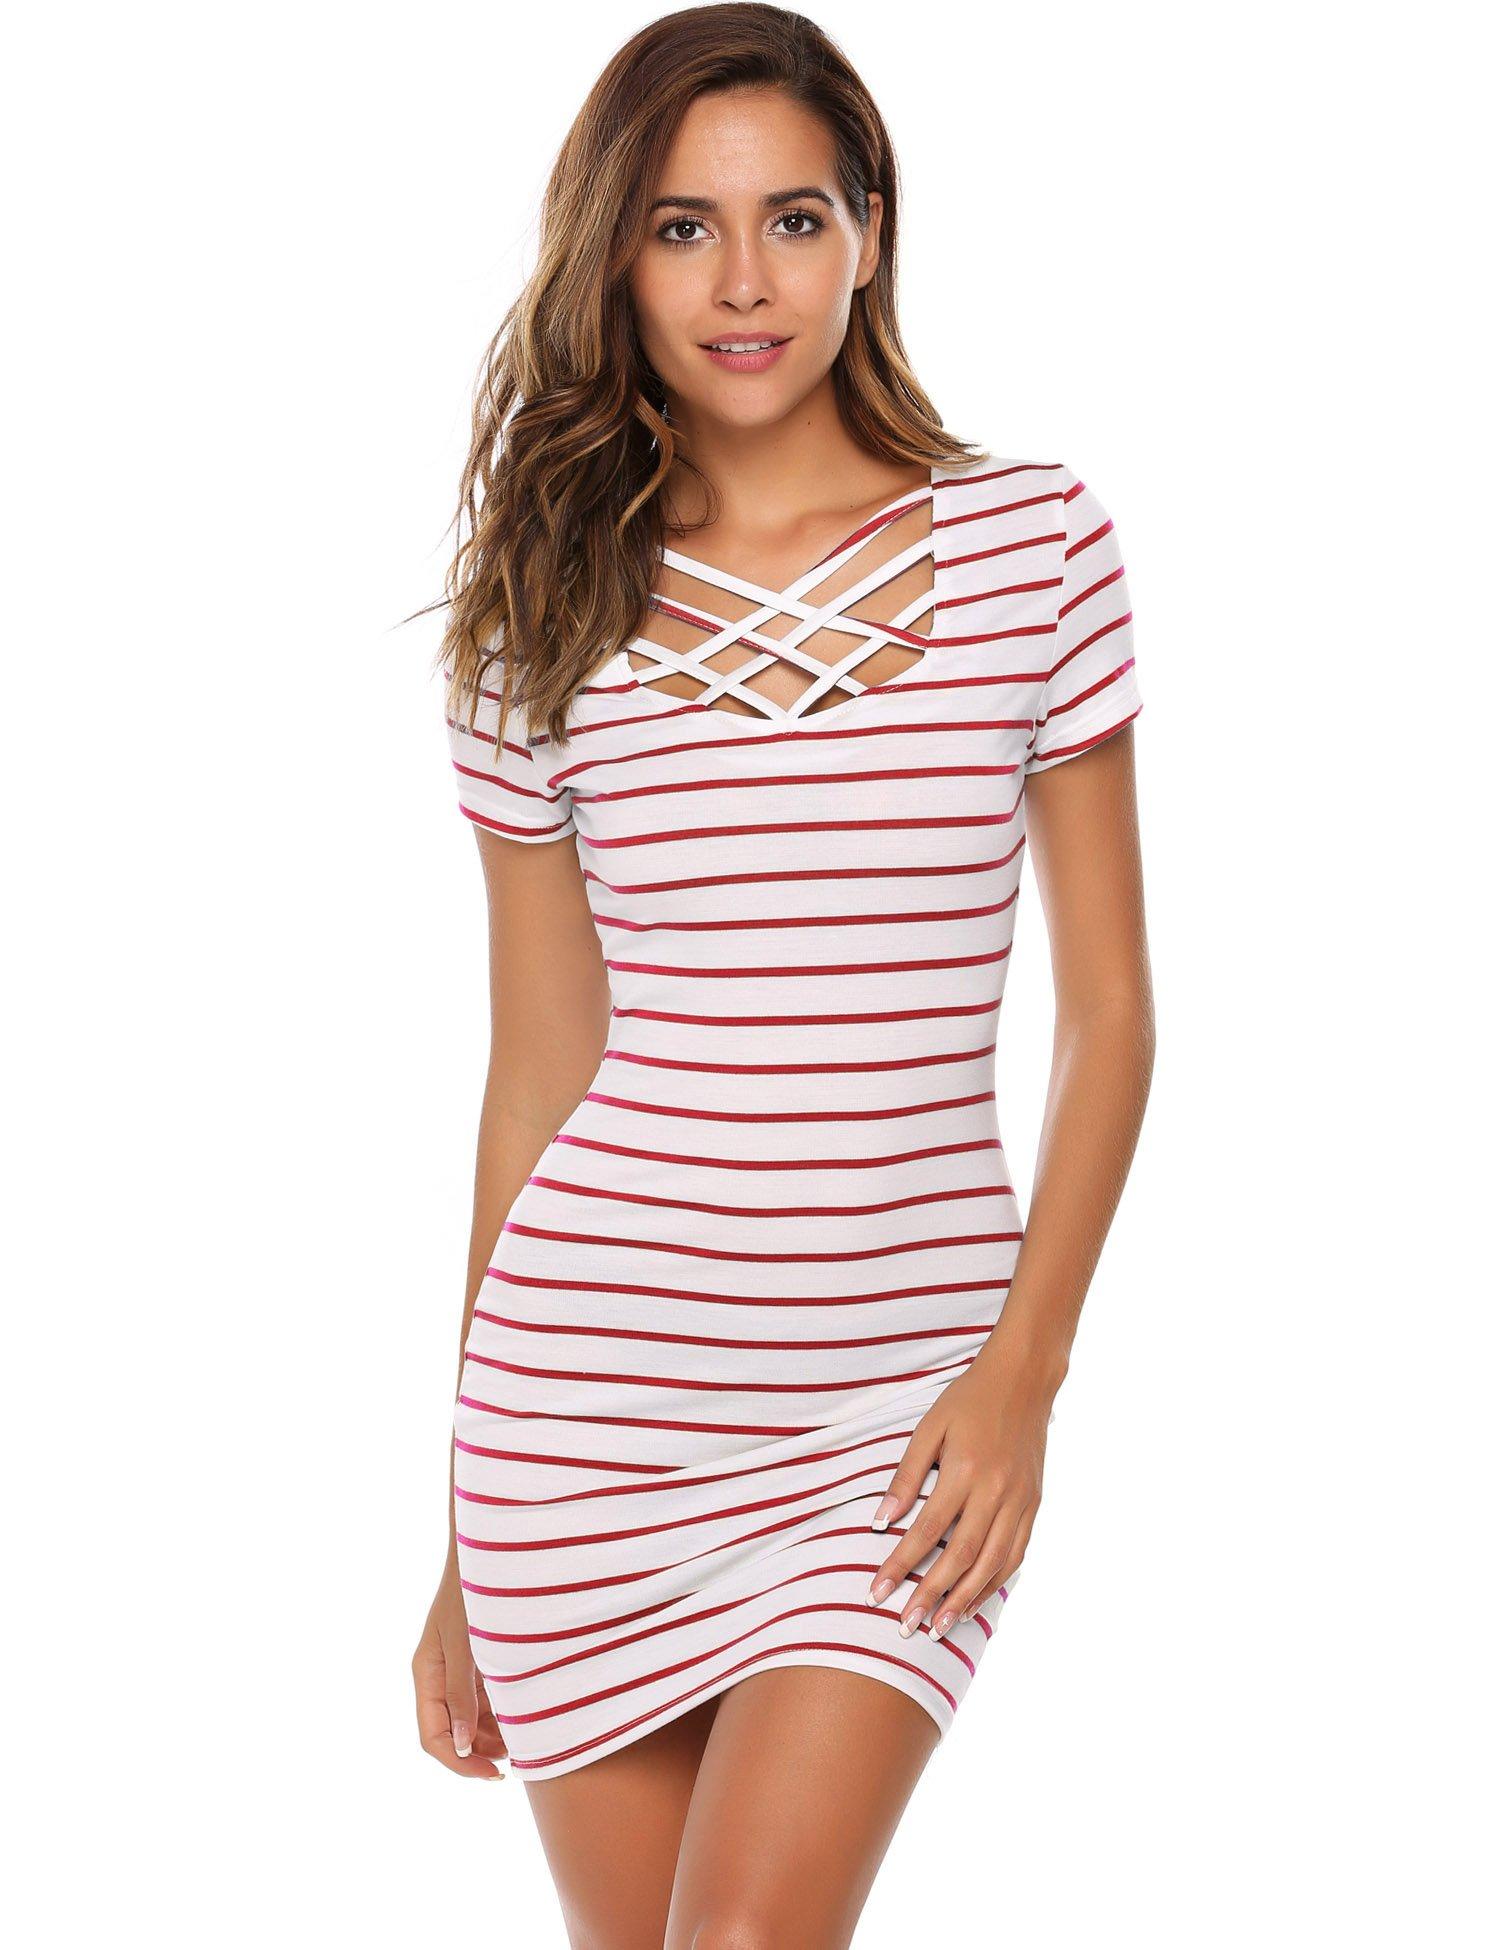 Zeagoo Women's V Neck Criss Cross Short Sleeve Striped Bodycon Mini Dress